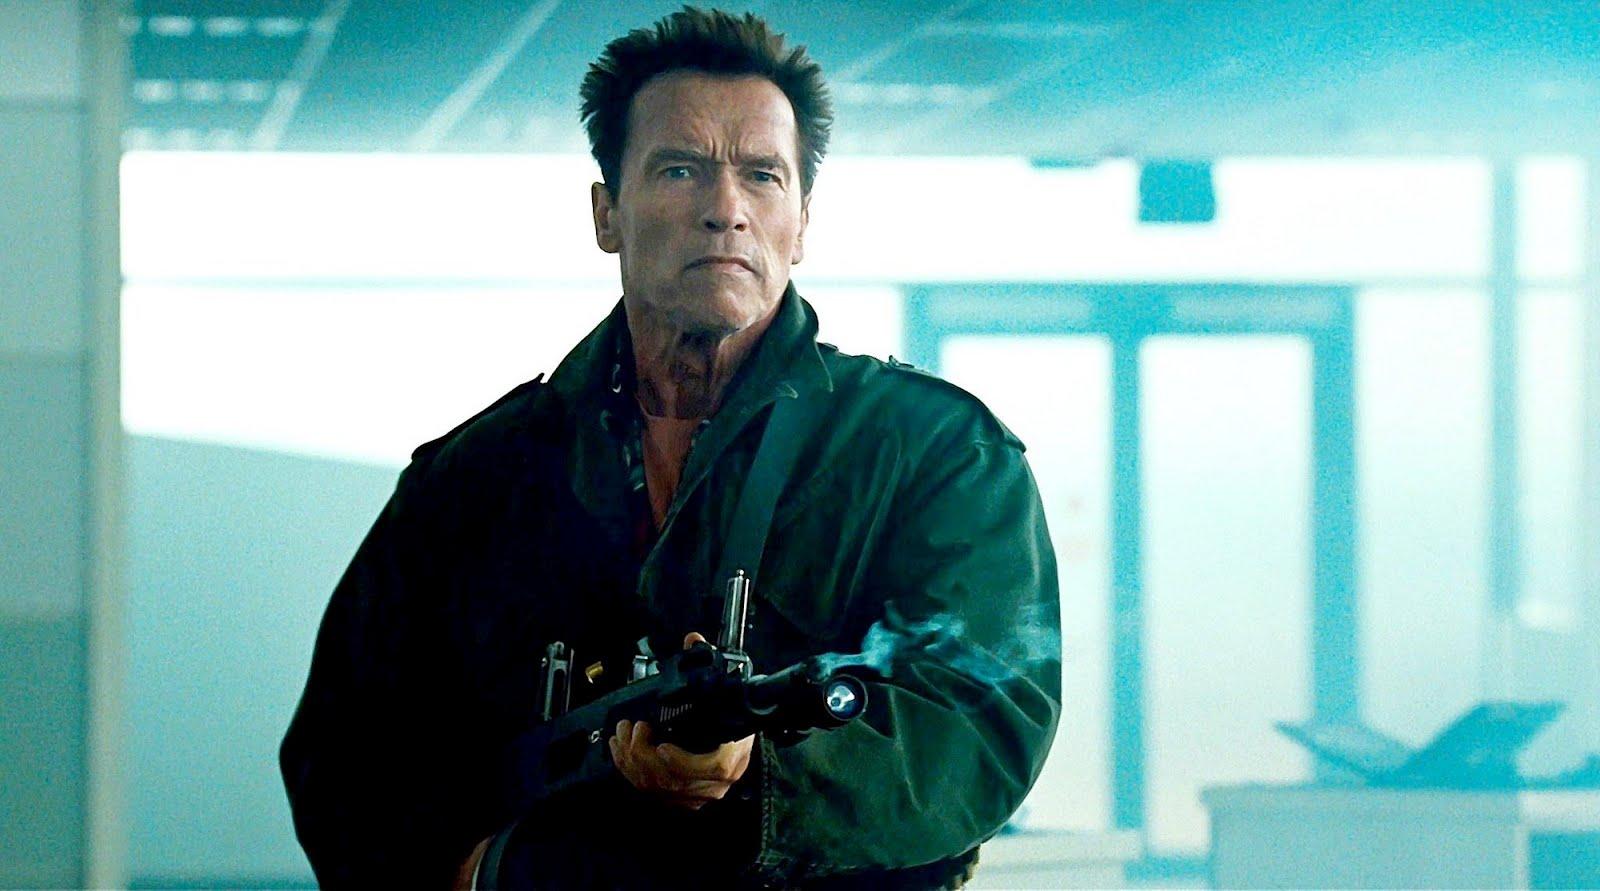 http://3.bp.blogspot.com/-ZElj51C-Kx4/TxpqCzUvl3I/AAAAAAAAUJI/qmQXtRmbTgQ/s1600/The-Expendables-2-2012-Arnold-Schwarzenegger-3.jpg